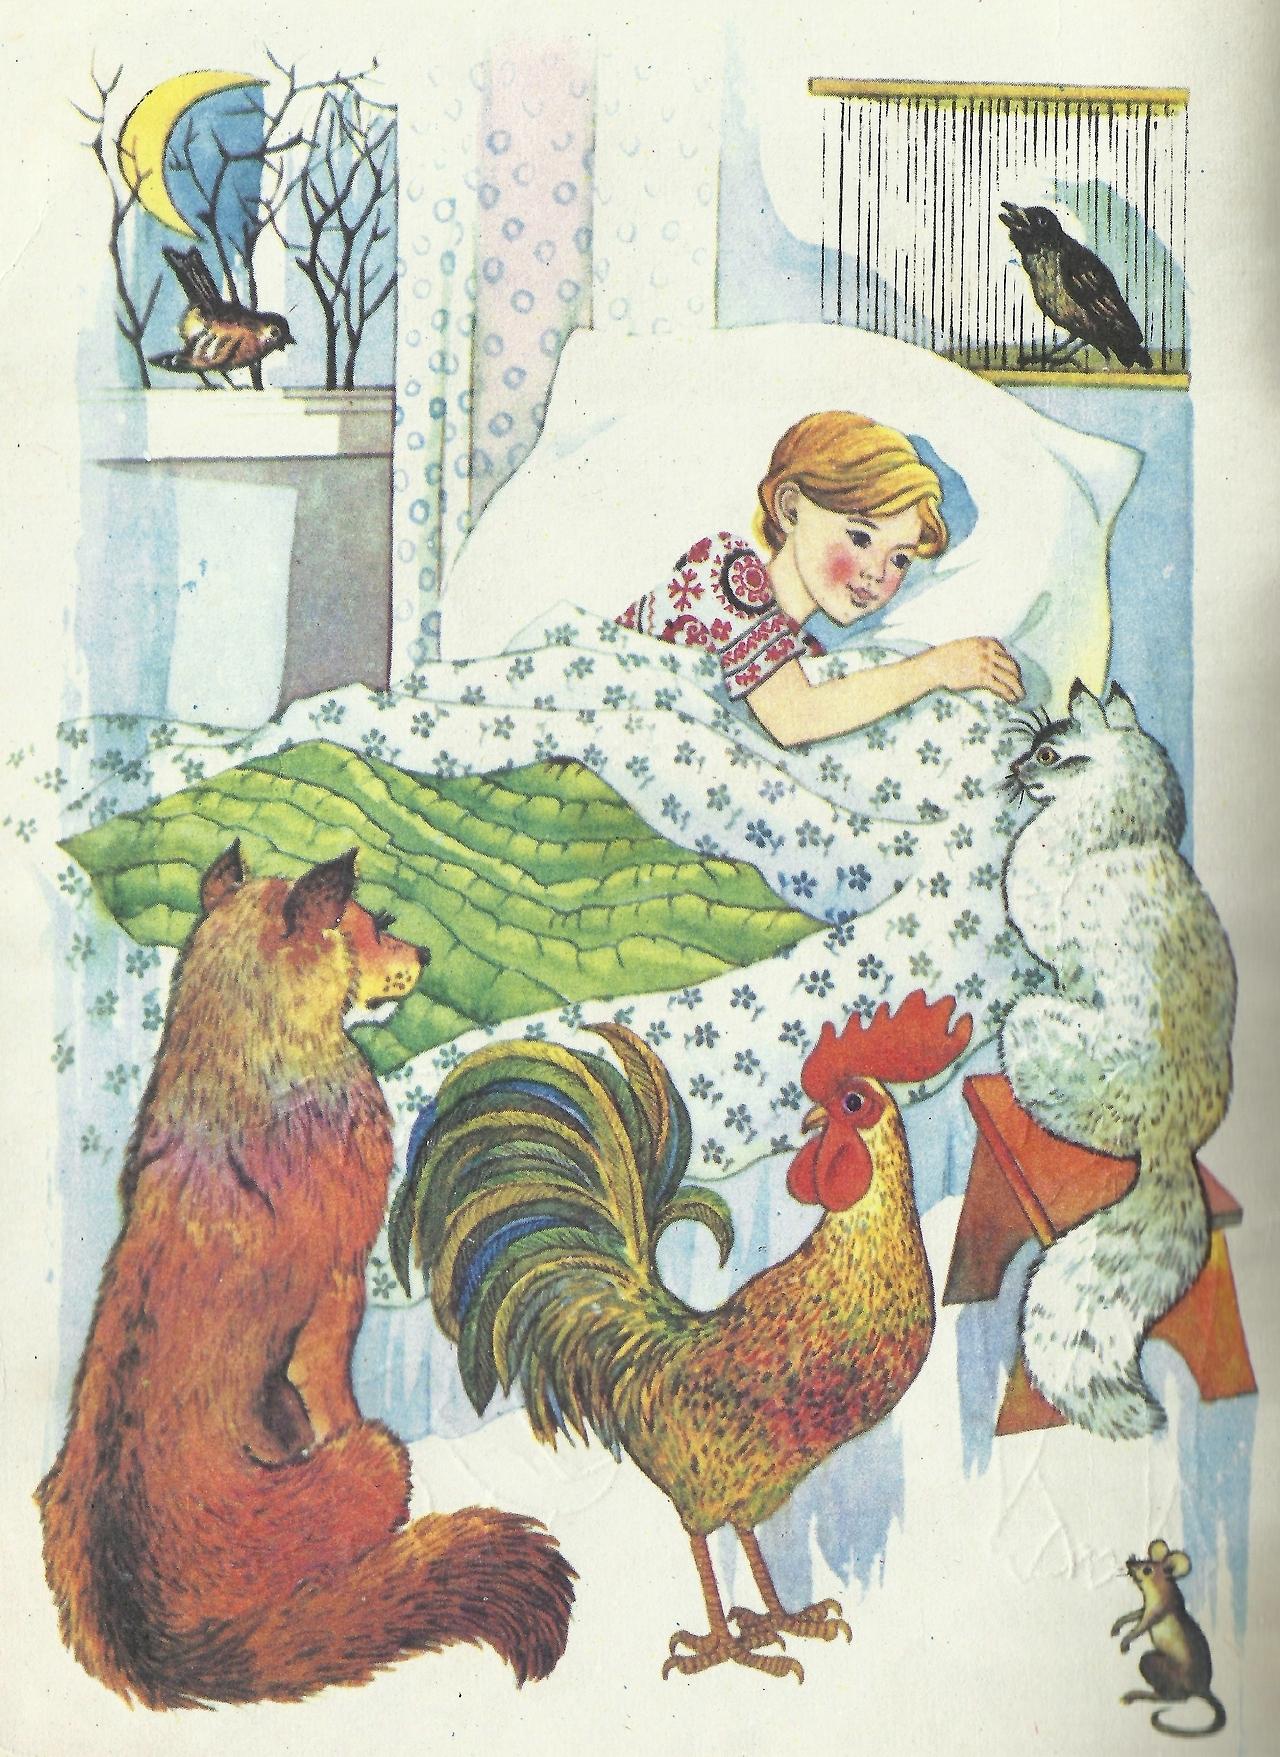 Картинка к аленушкиным сказкам